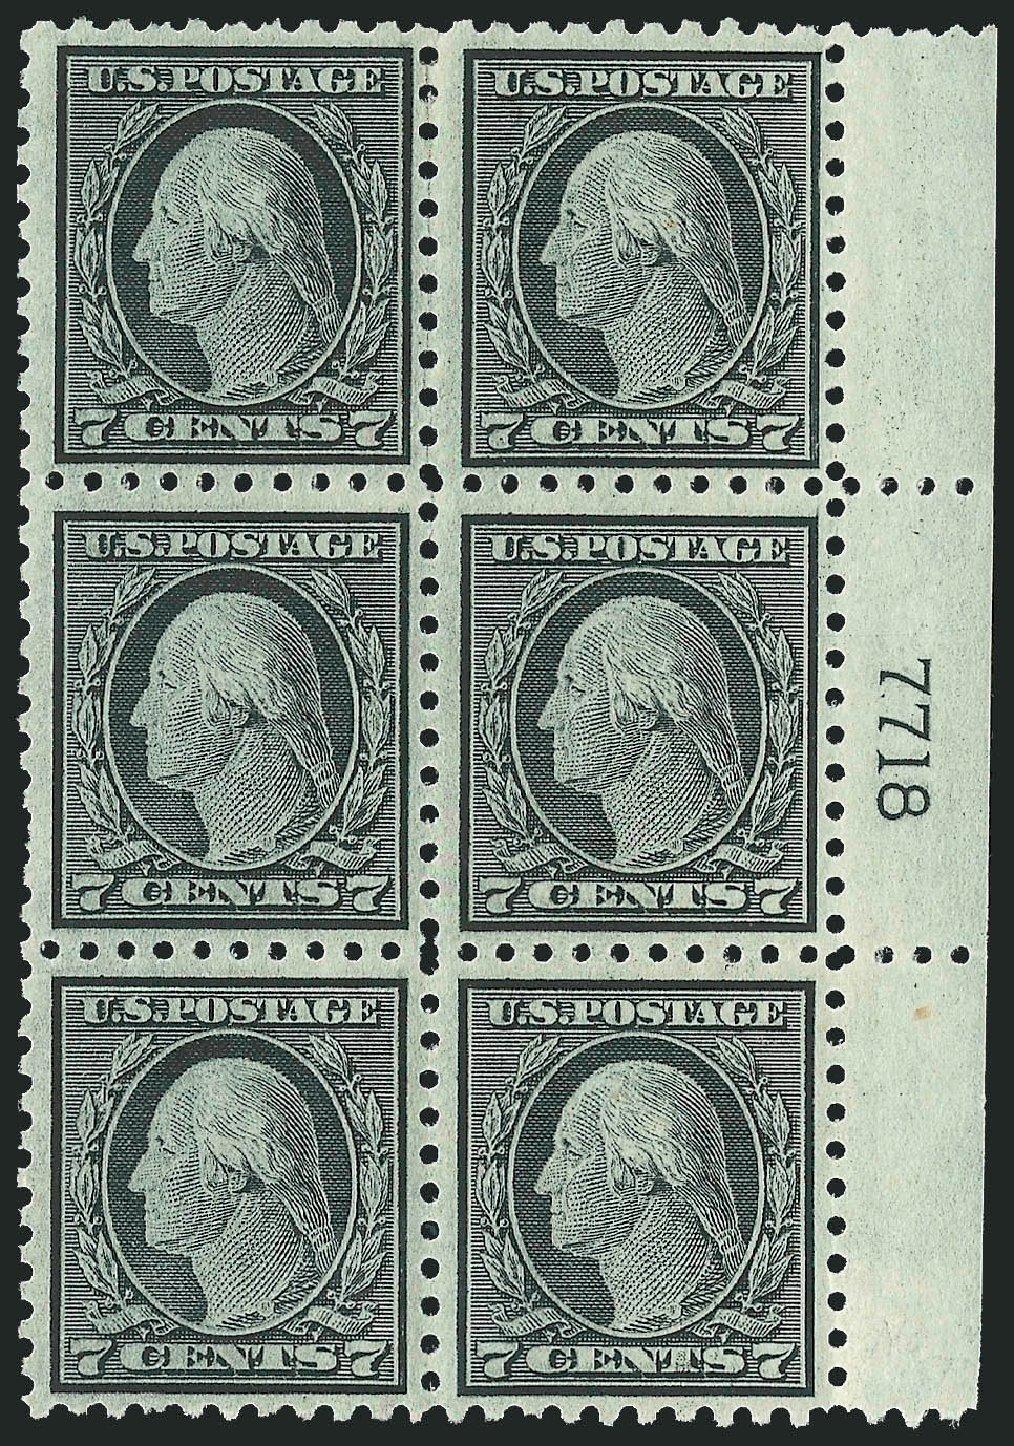 US Stamps Value Scott Catalogue # 469 - 1916 7c Washington Perf 10. Robert Siegel Auction Galleries, Jul 2014, Sale 1077, Lot 284